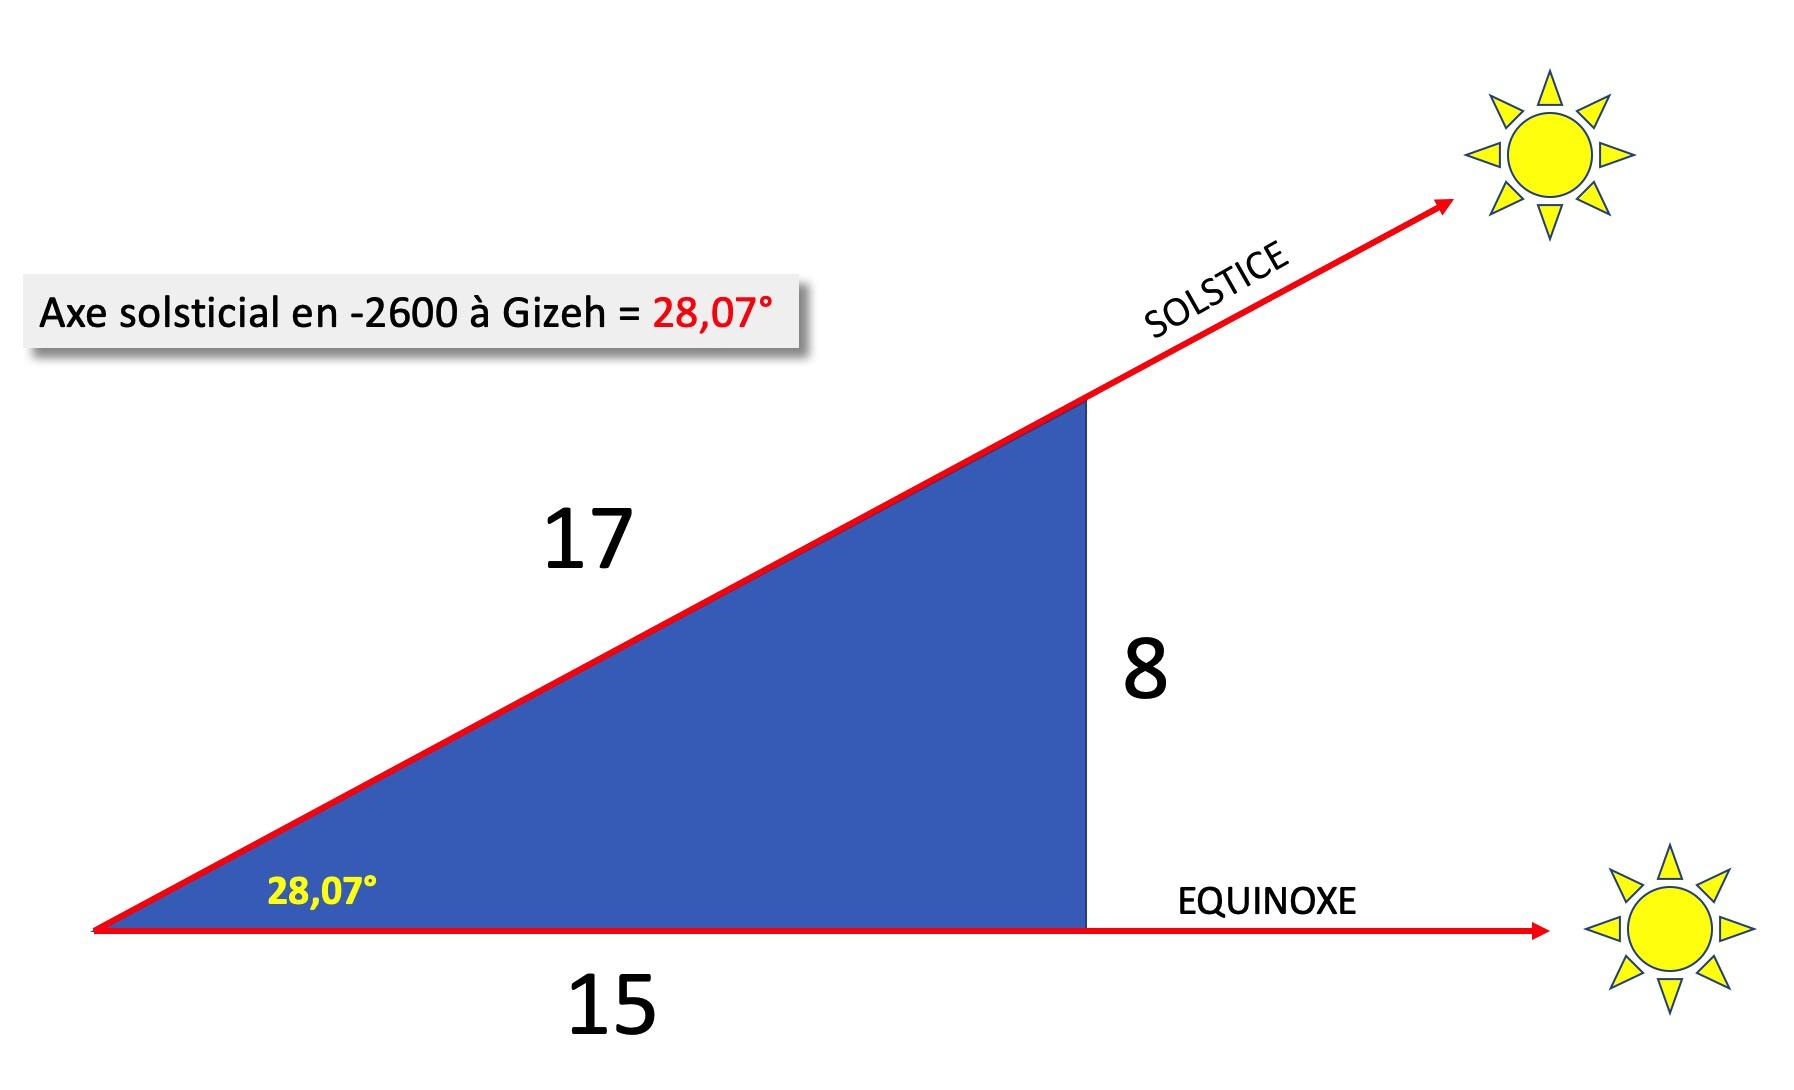 2020-06-12 13:53:17